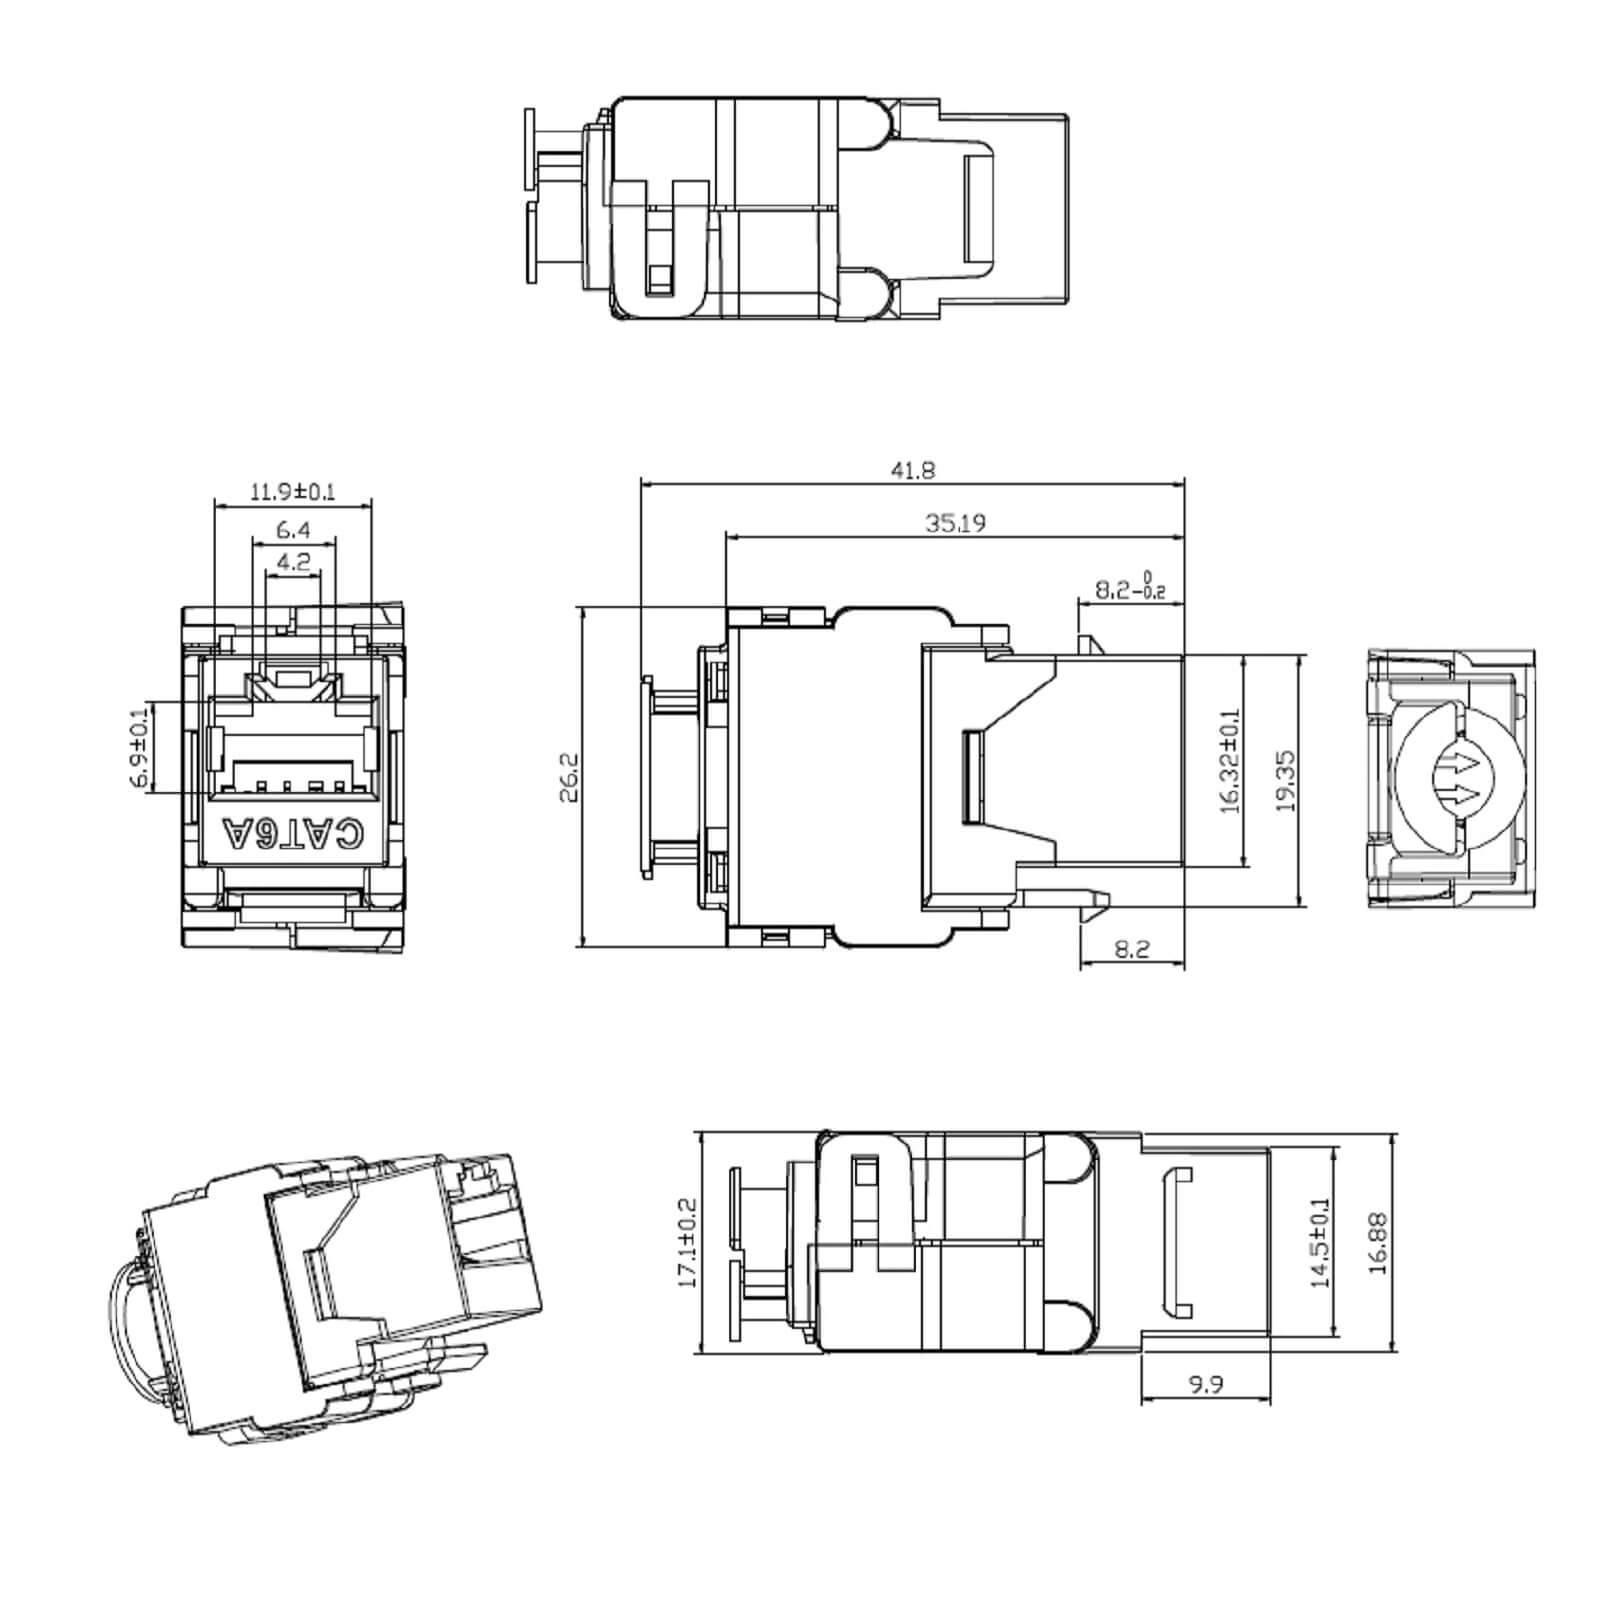 1x Keystone Jack Modul Cat 6a Rj45 Stp Werkzeuglos